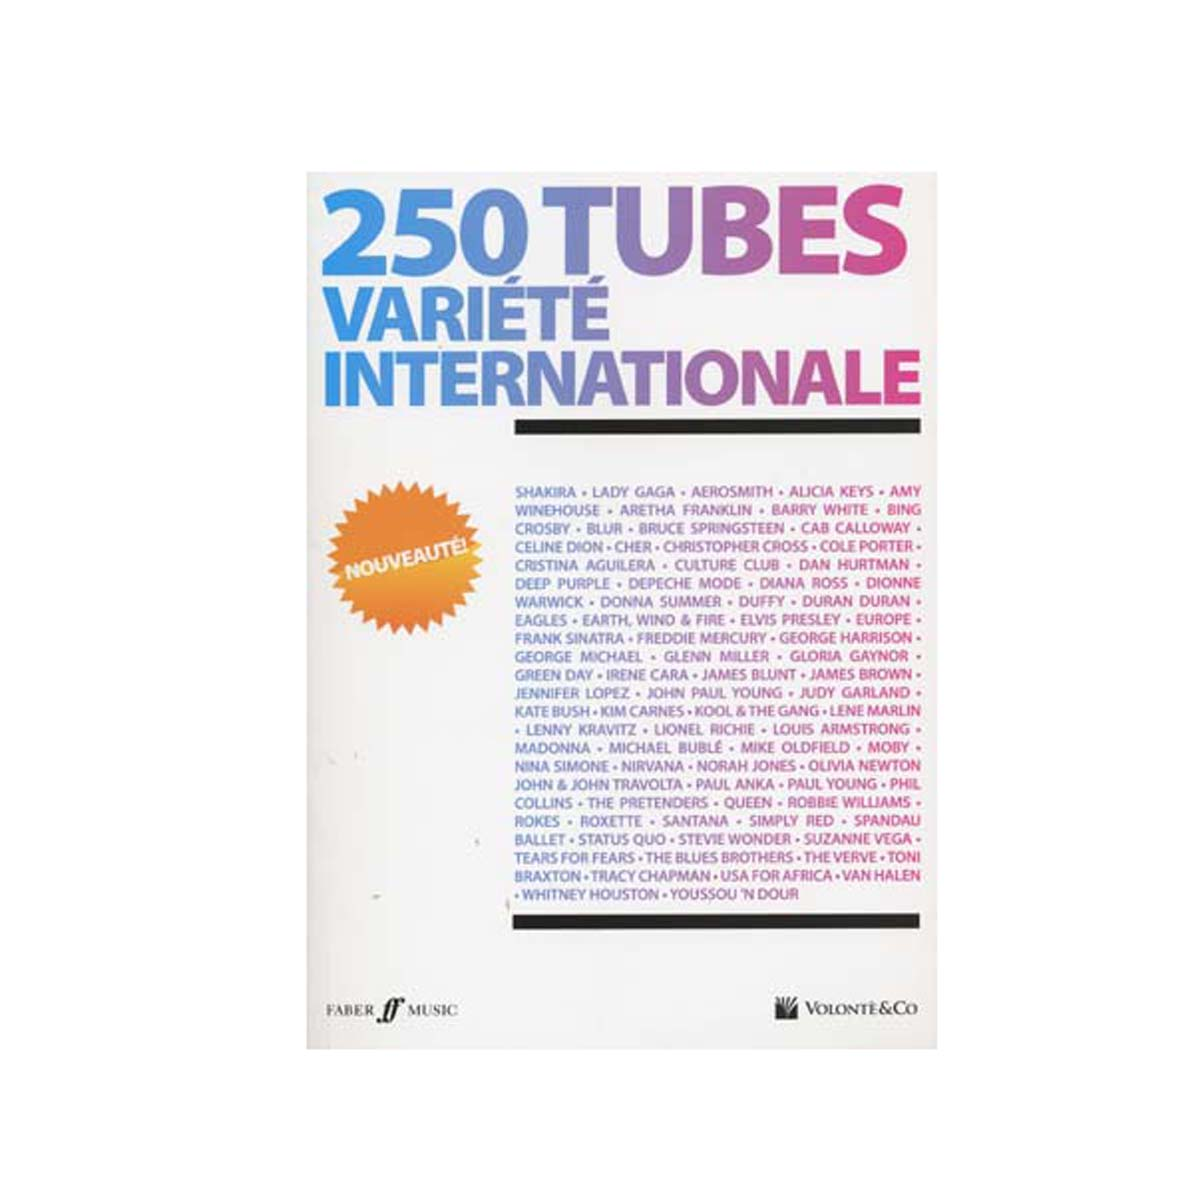 250 tubes variété internationale